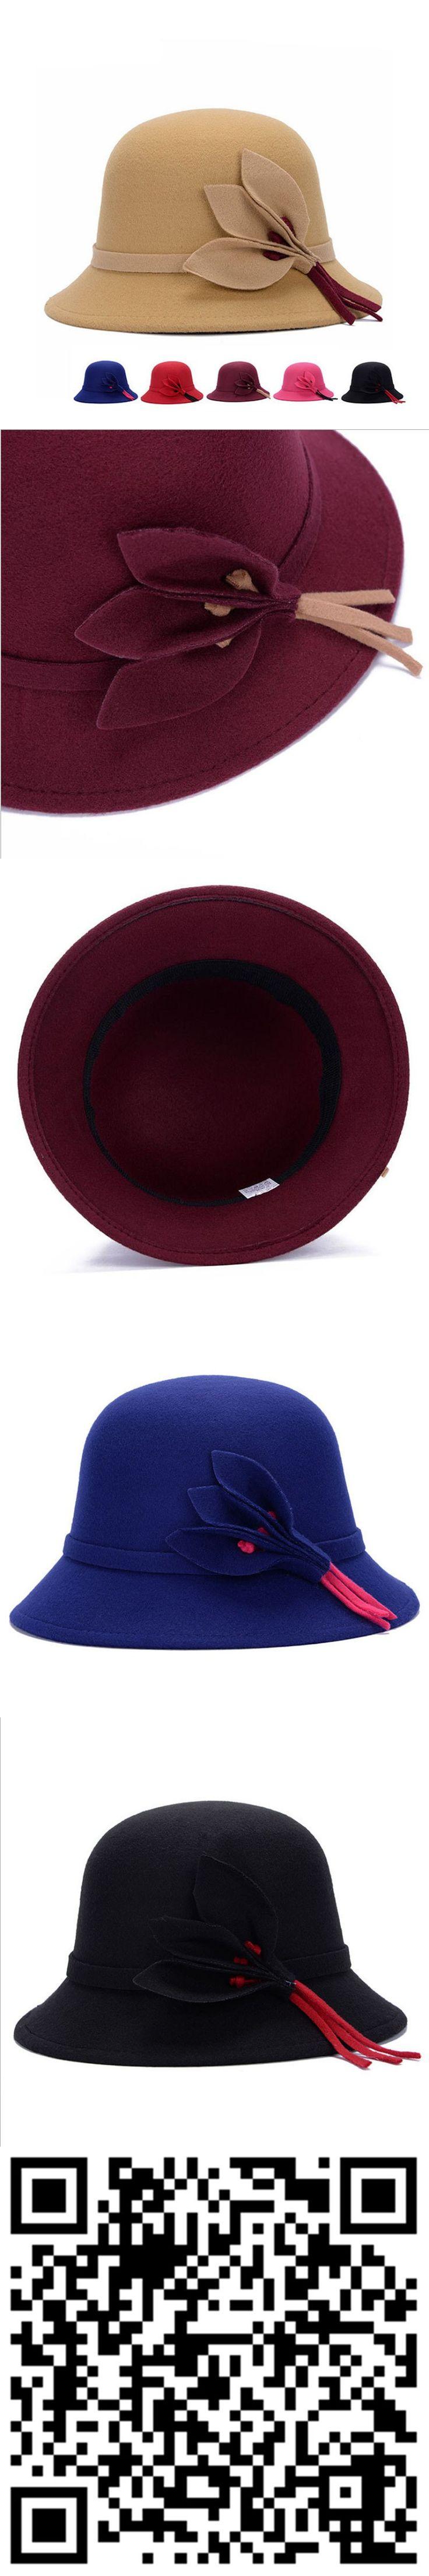 2015 NEW Winter Fedora Hats For Women Vintage Wool Felt Bowler Wide Brim Fashion Women Girls Sun Caps Floral Bucket Hat $5.2